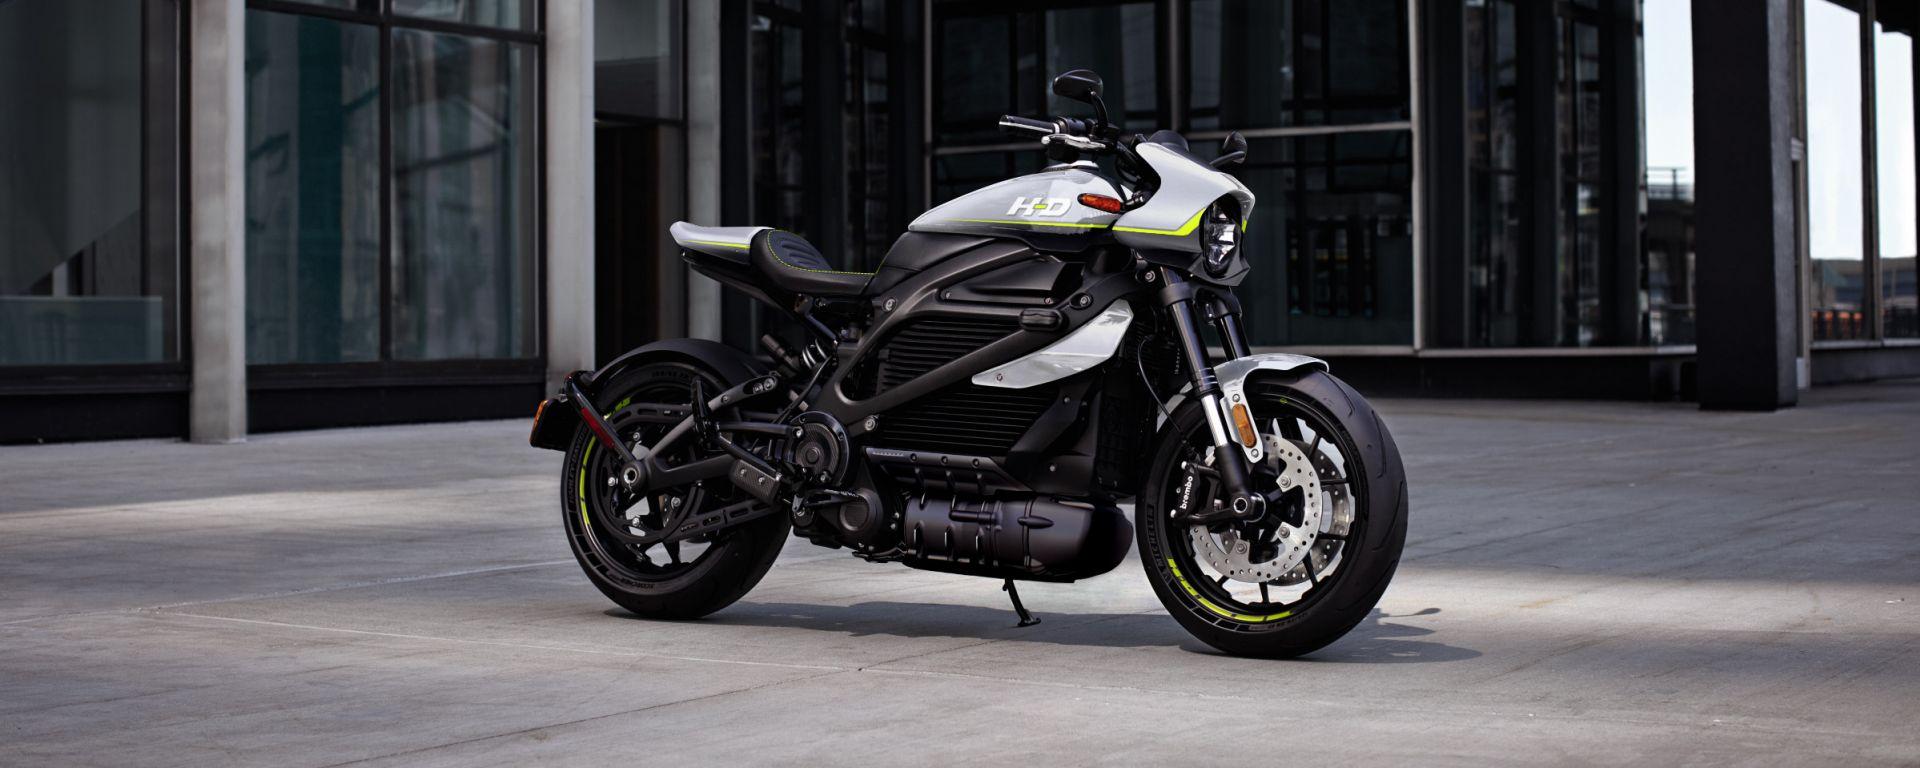 L'Harley-Davidson LiveWire unica verrà battuta all'asta da Bonhams a New York